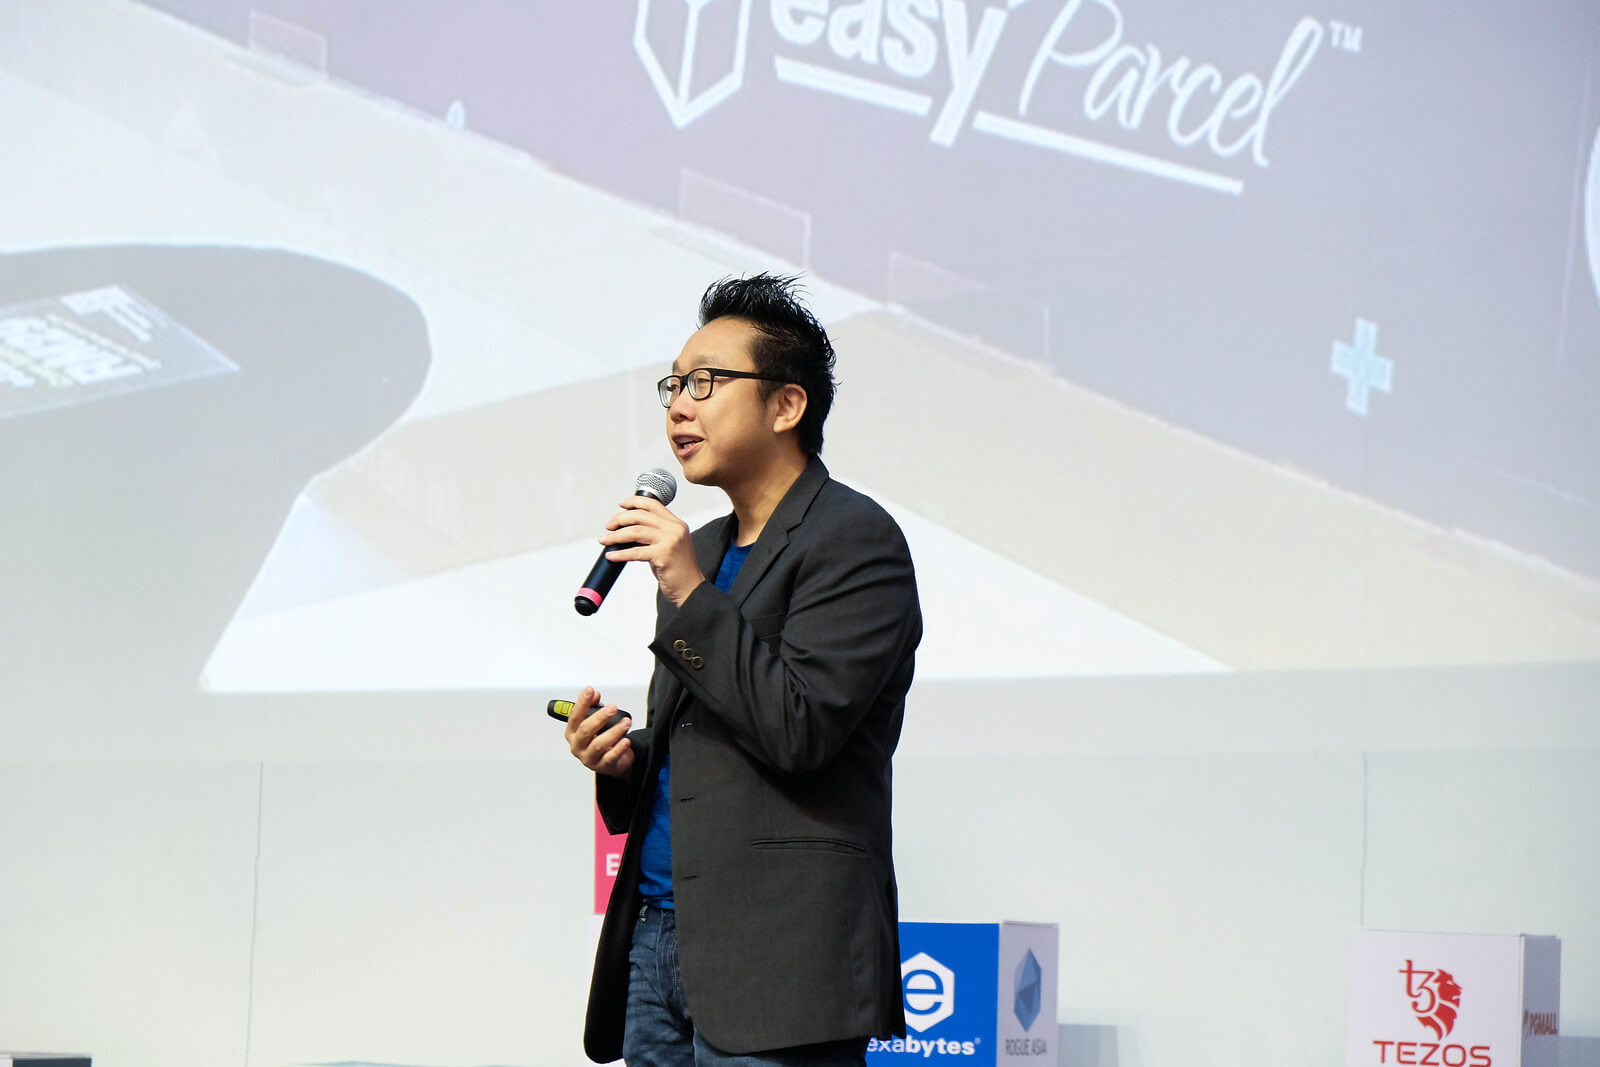 EIMS 2019 Exabytes CEO Chan Kee Siak